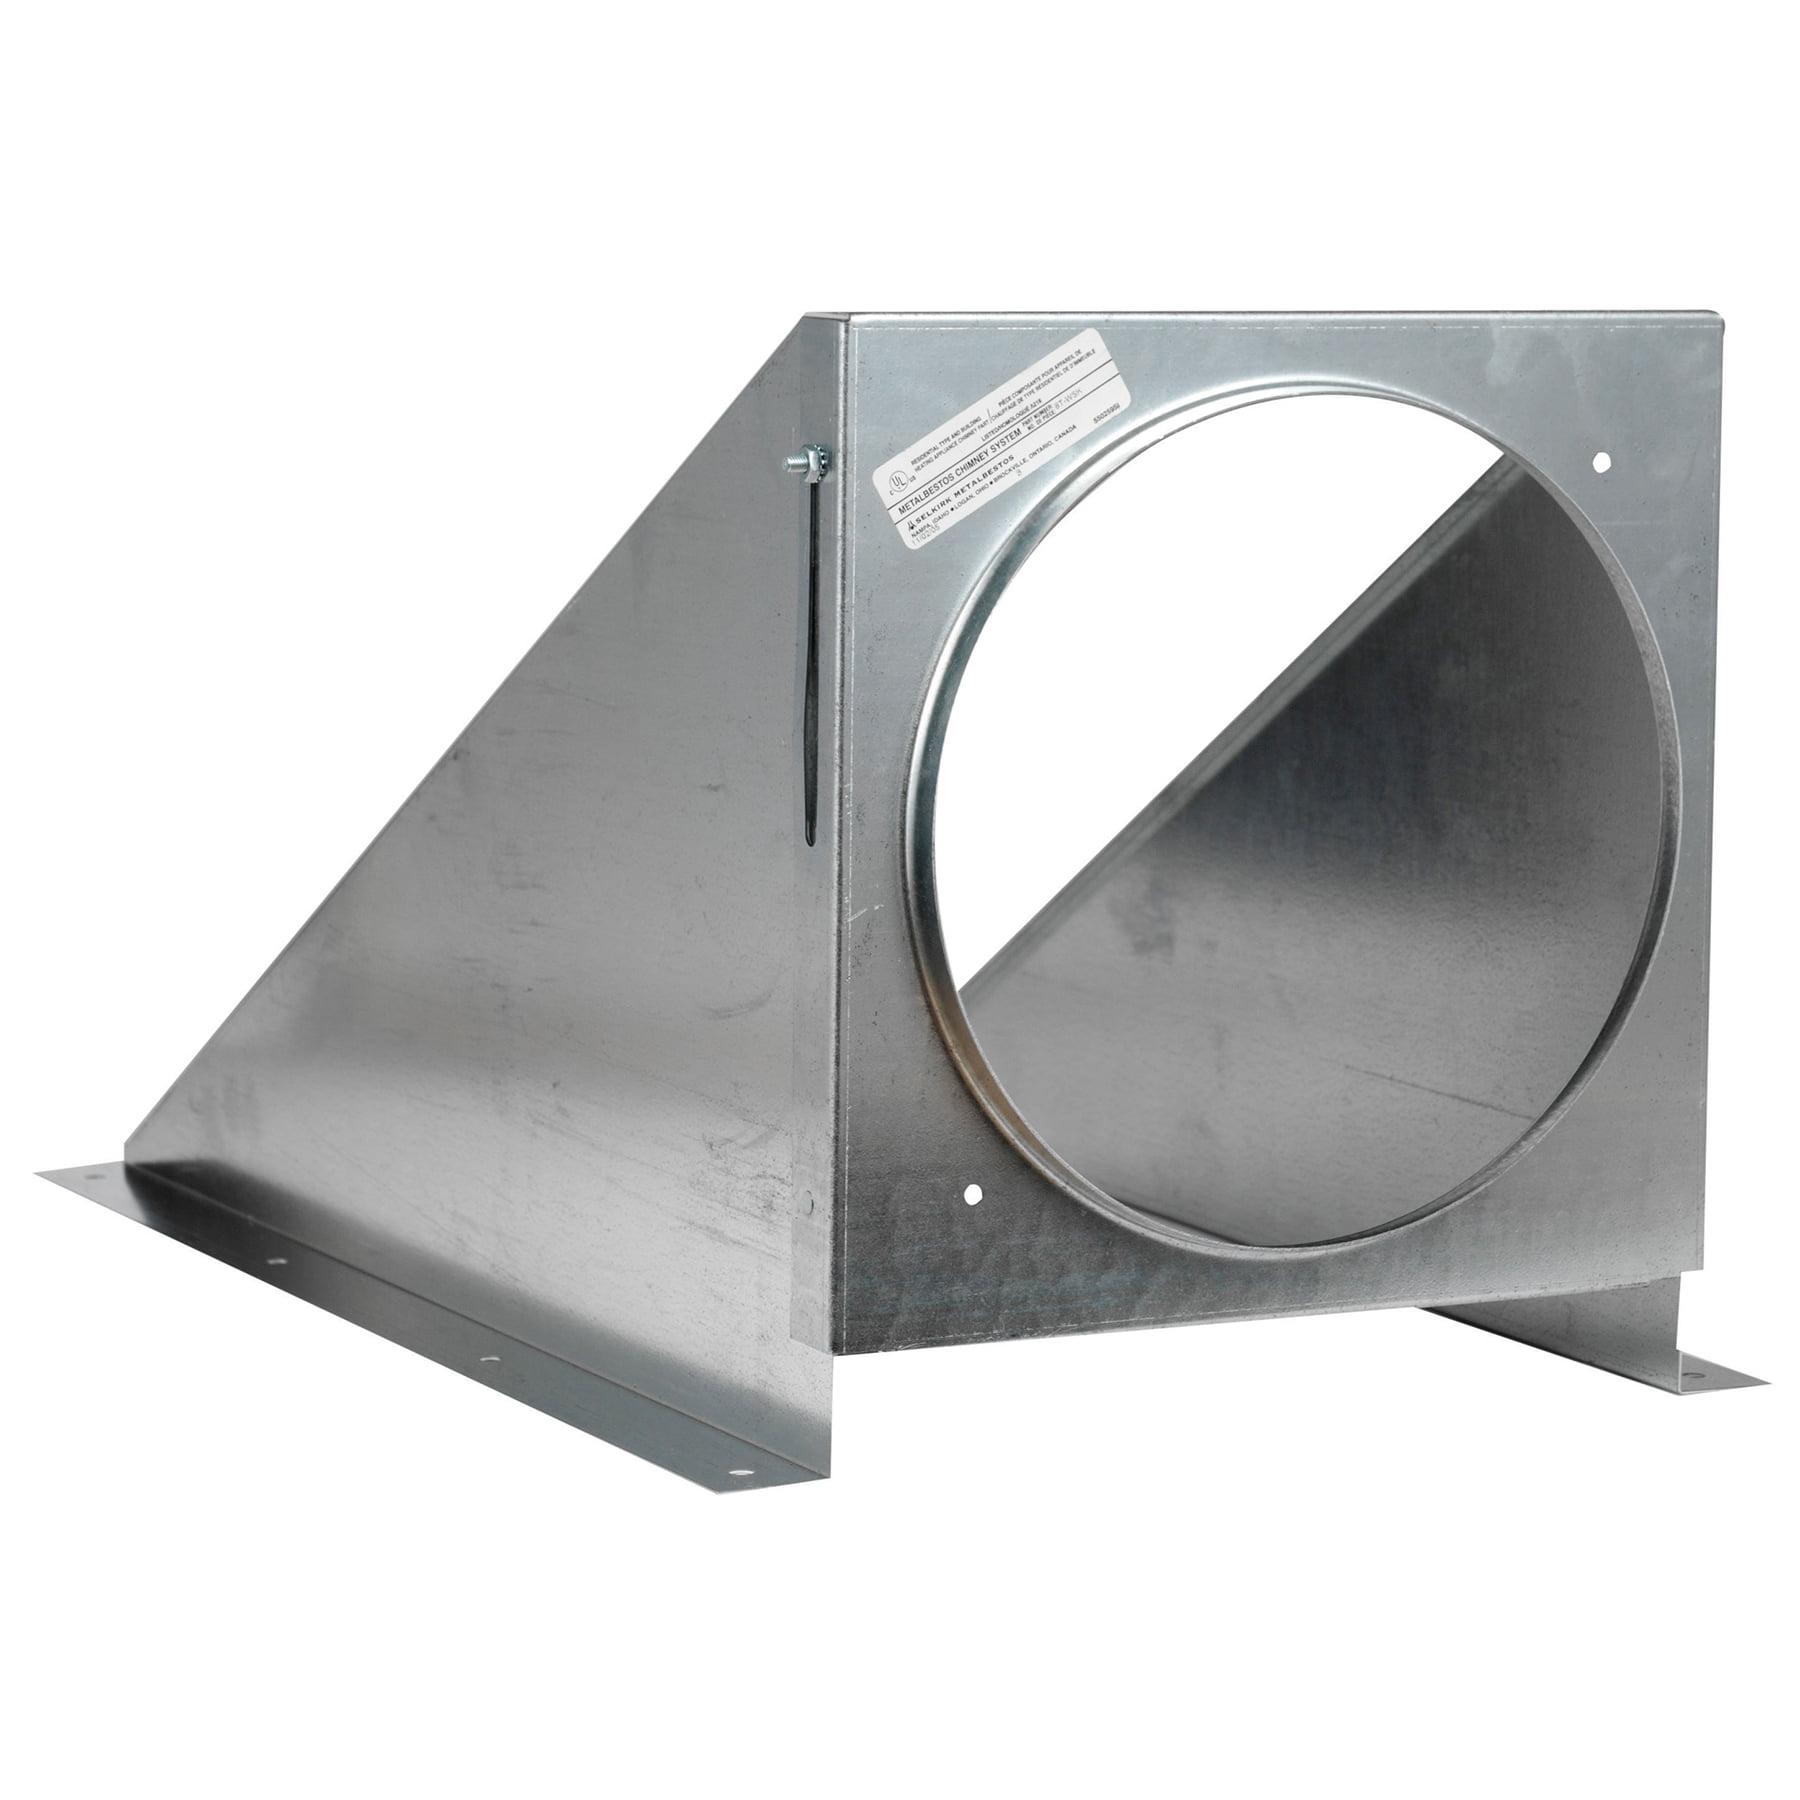 Selkirk 8T-WSK Galvanized Steel Wall Support Package